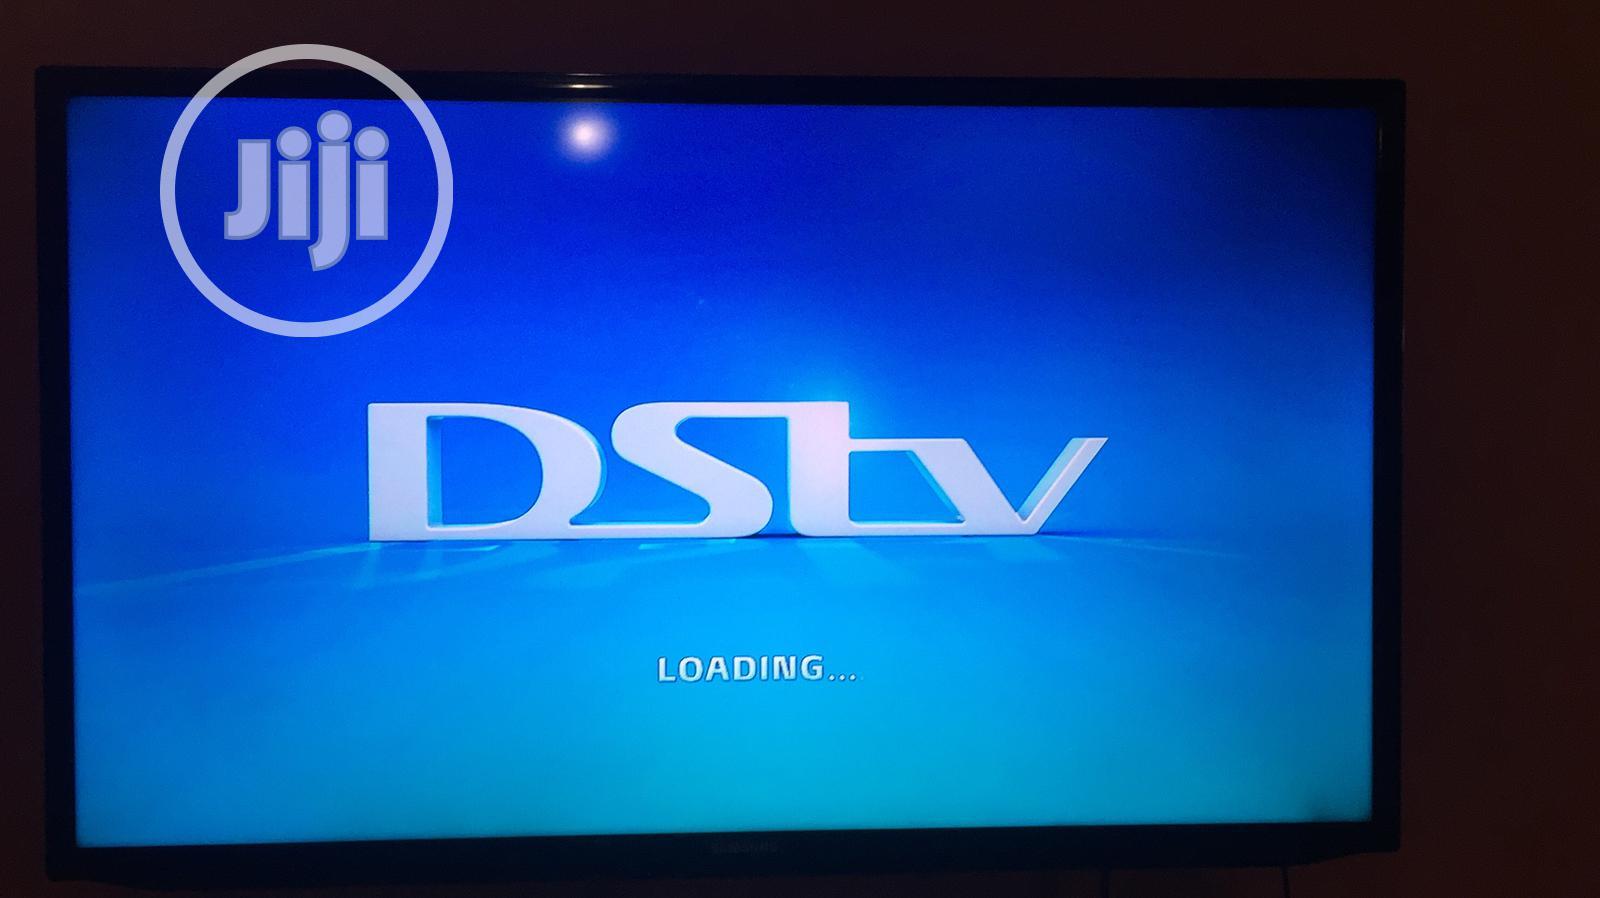 Archive: Samsung LED TV 43 Series 5 N5000